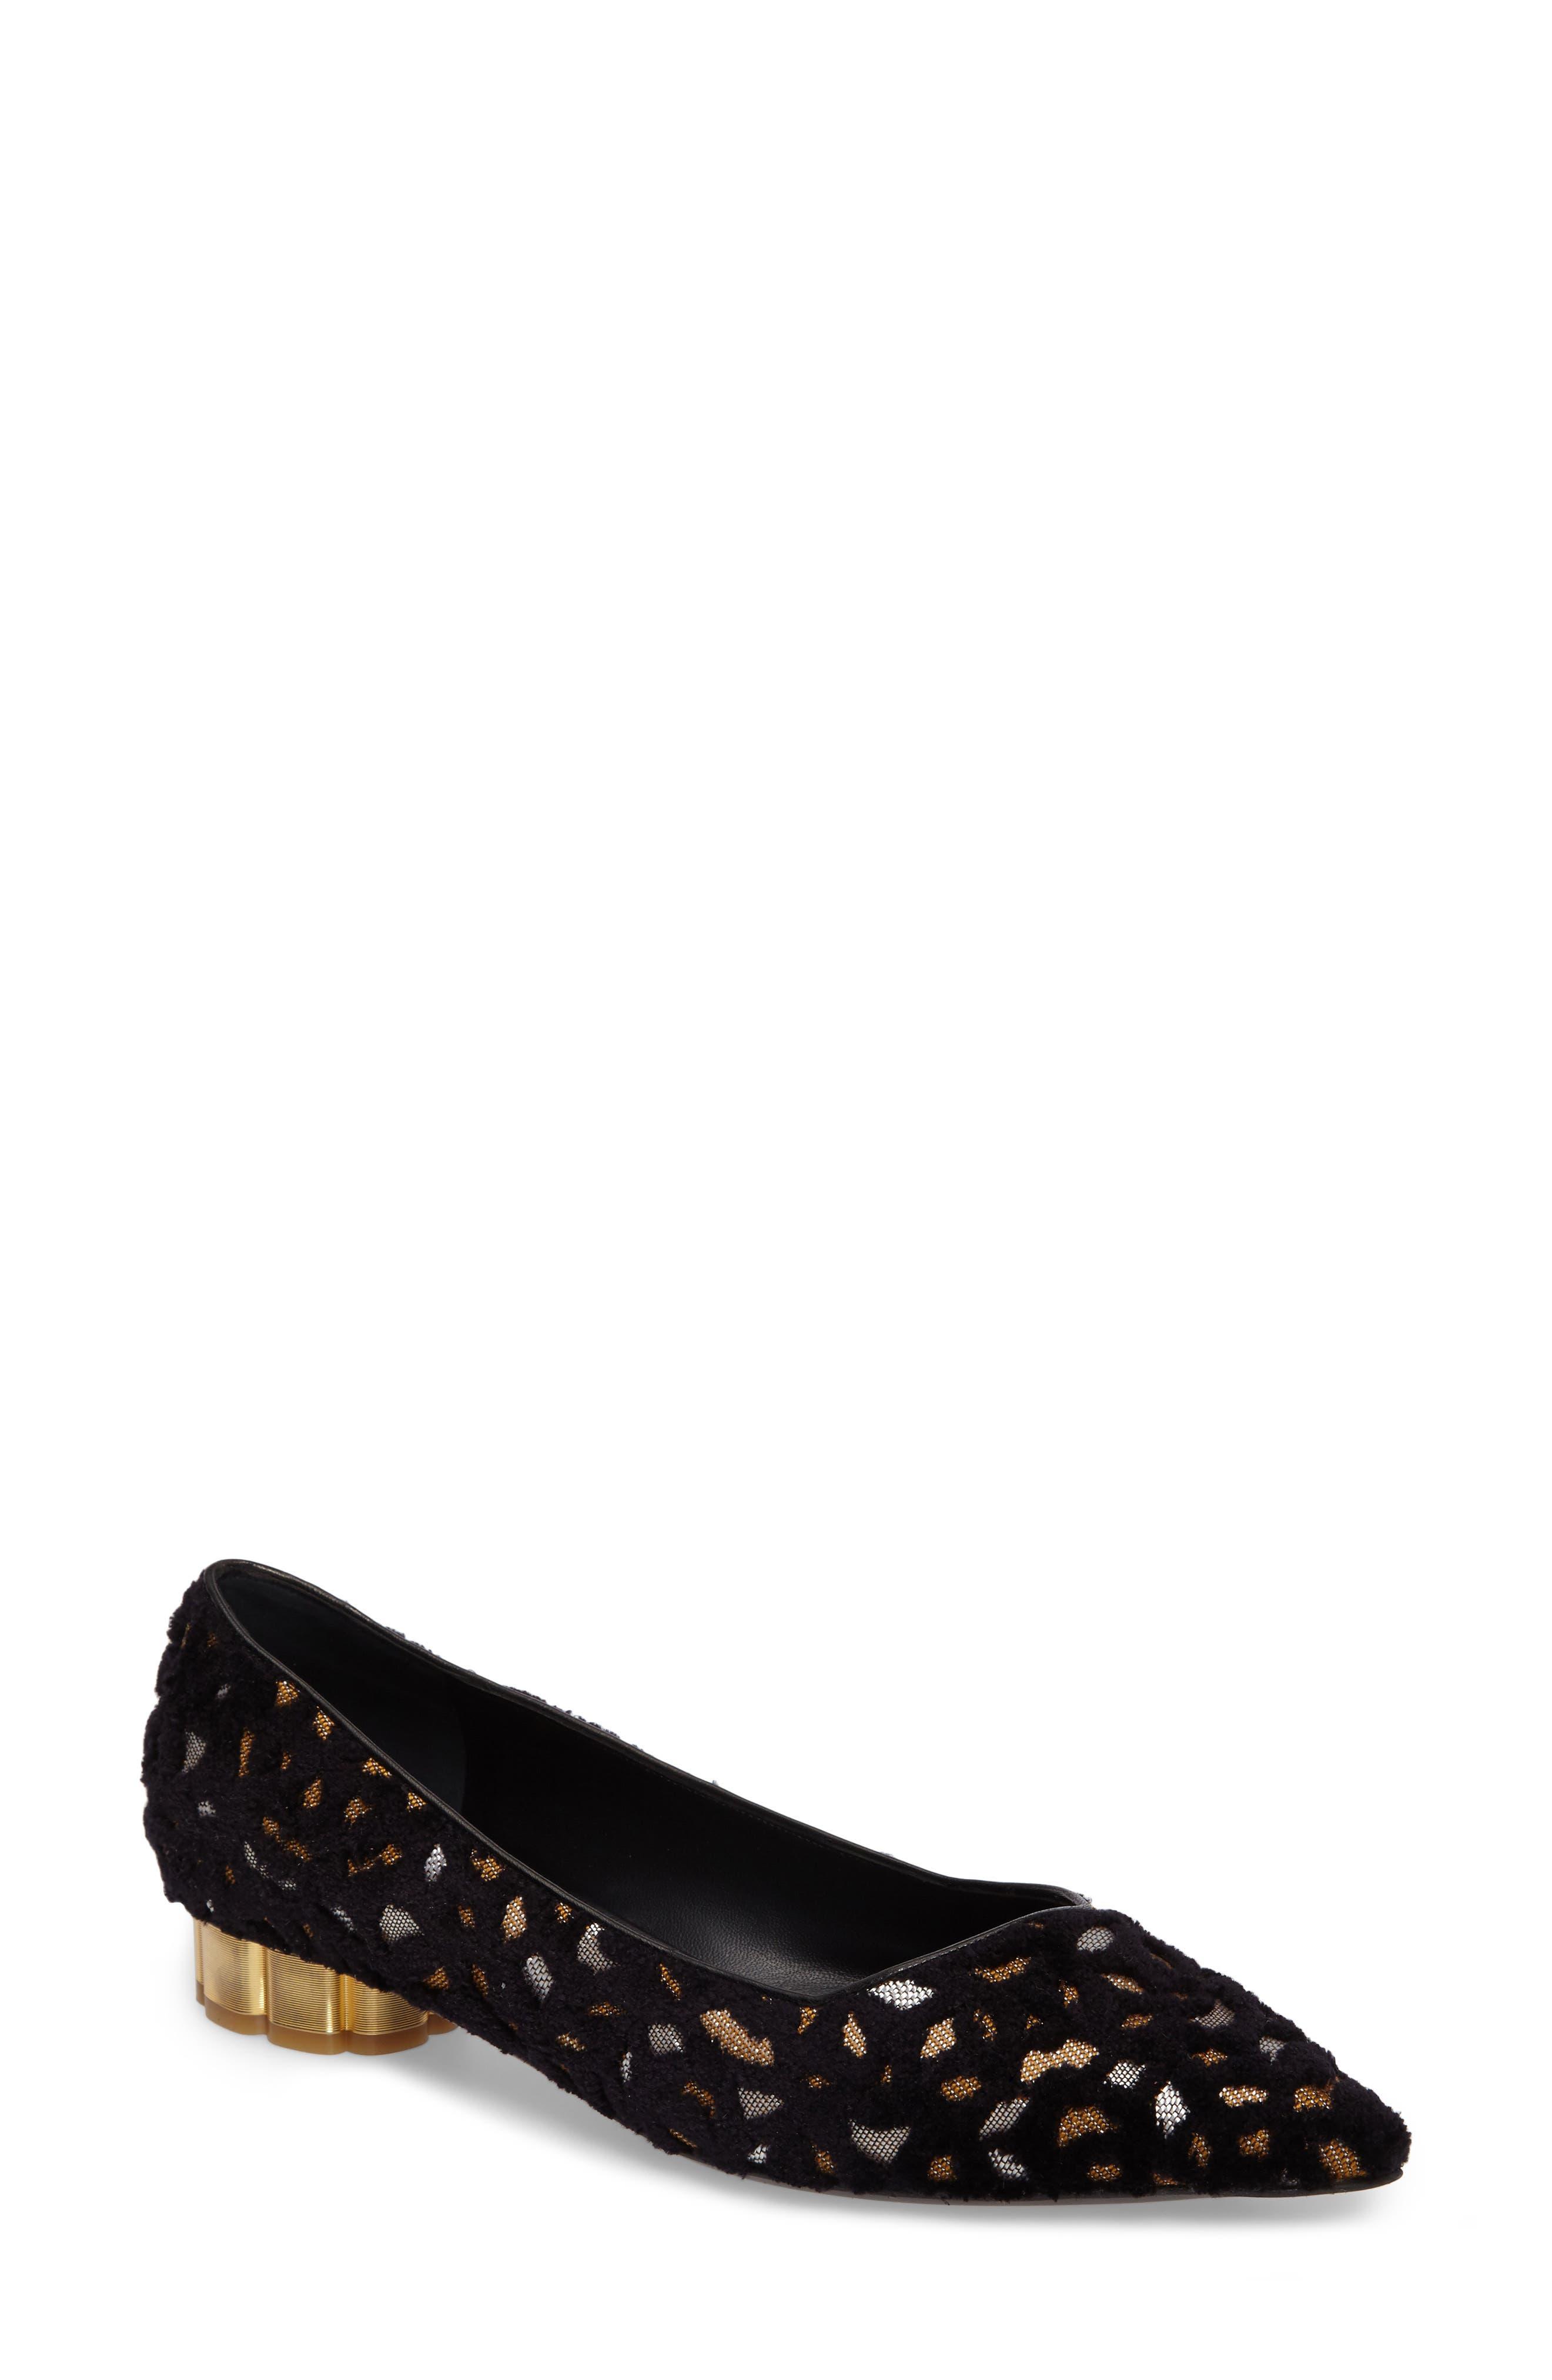 Alternate Image 1 Selected - Salvatore Ferragamo Flower Heel Flat (Women)